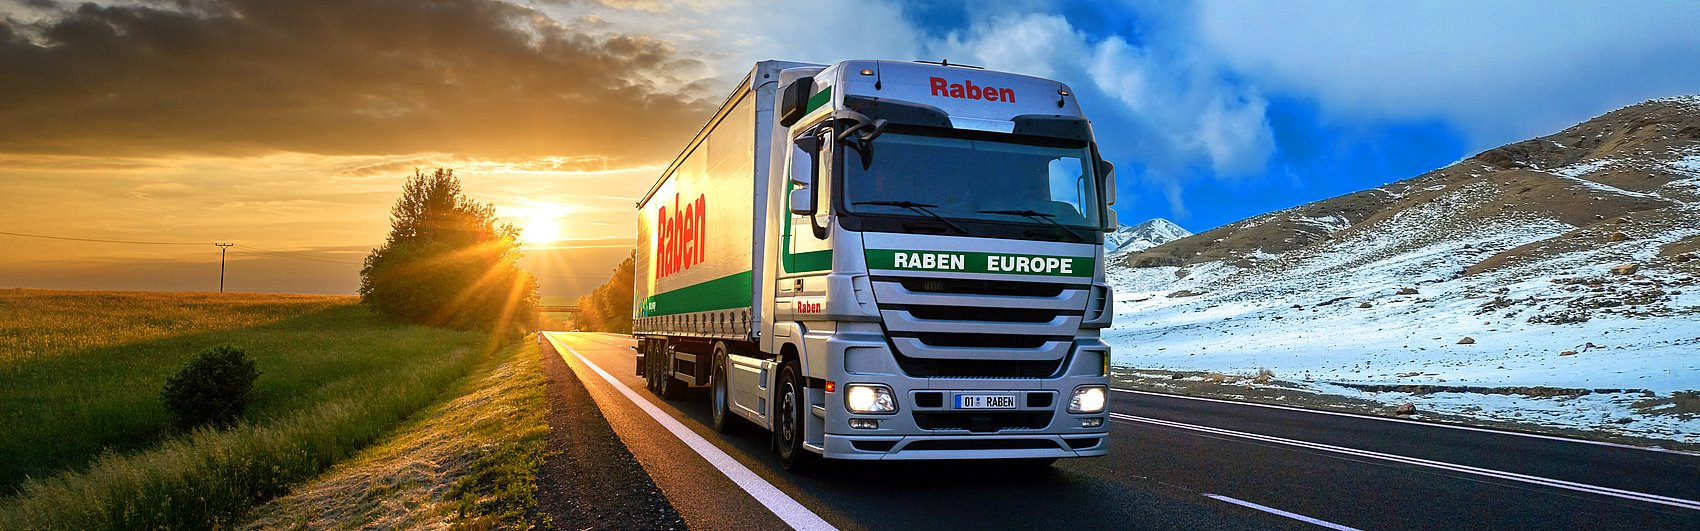 csm_KV_2019_Raben_Group_Europe_995da3b8aa.jpg